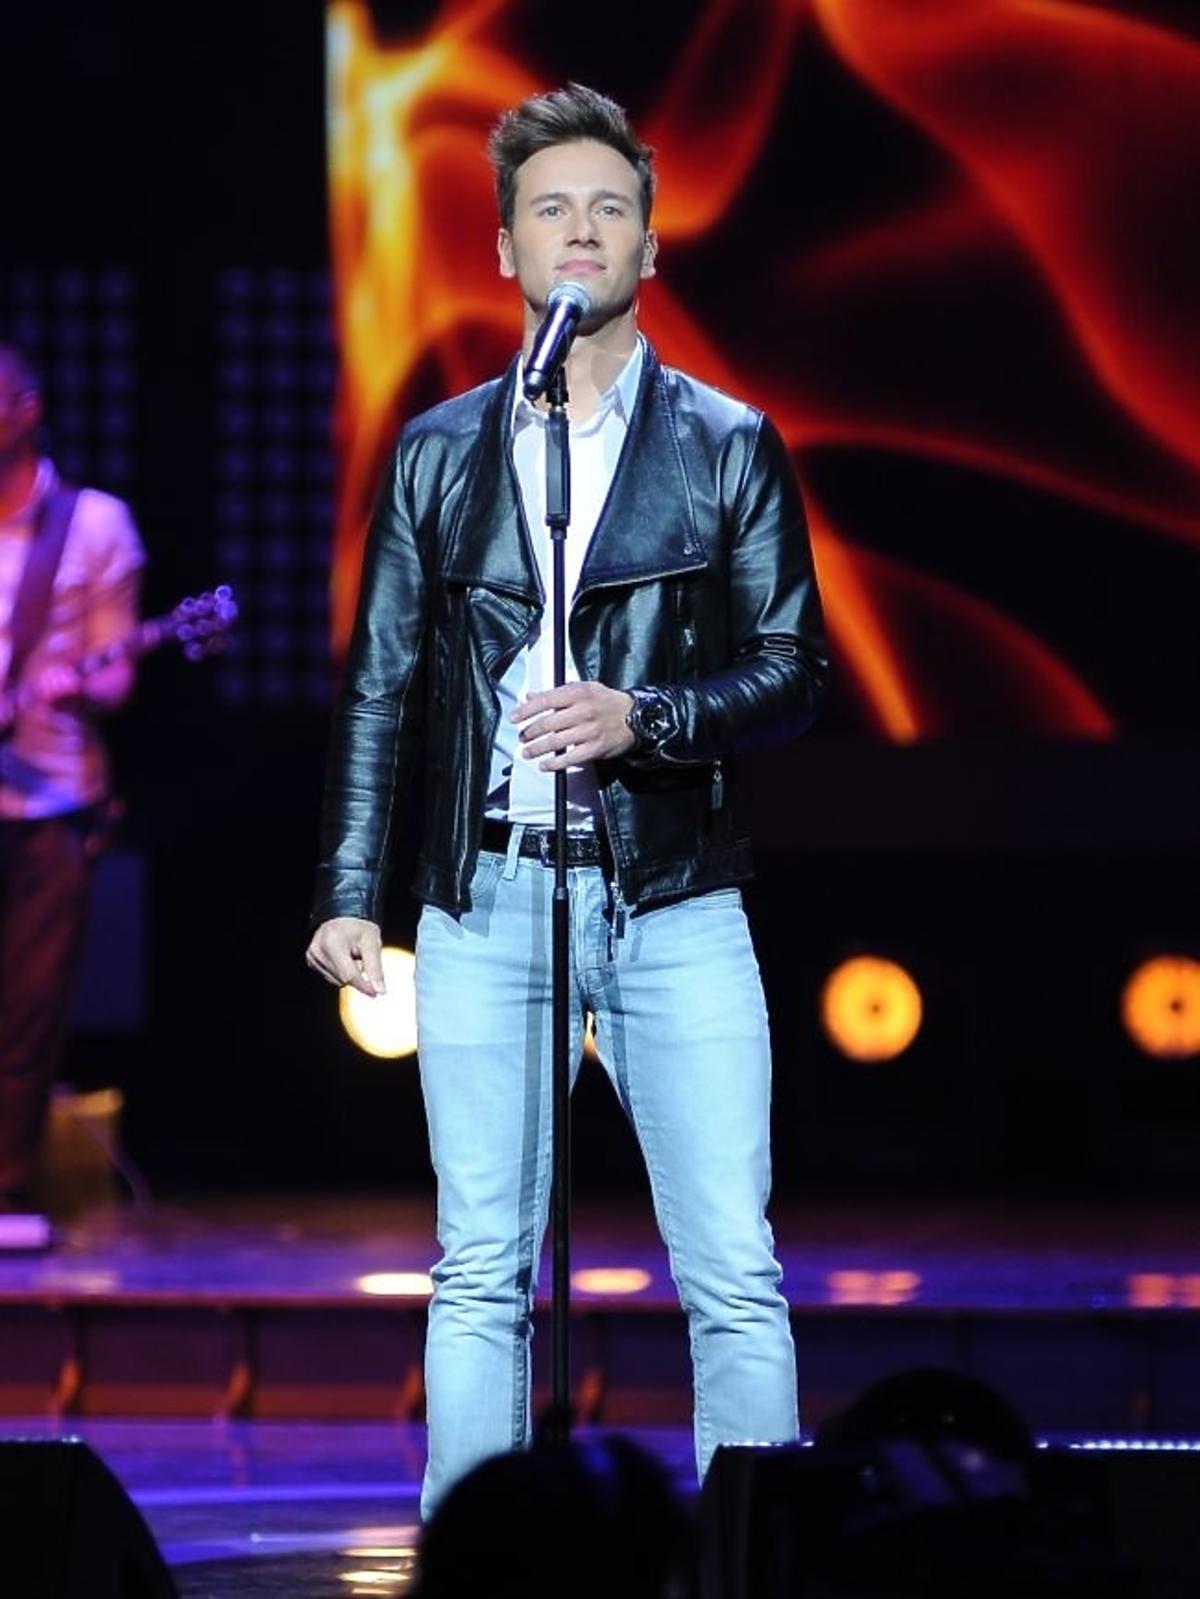 Yannick Bovy podczas pierwszego dnia Sopot Top of the Top Festival 2013